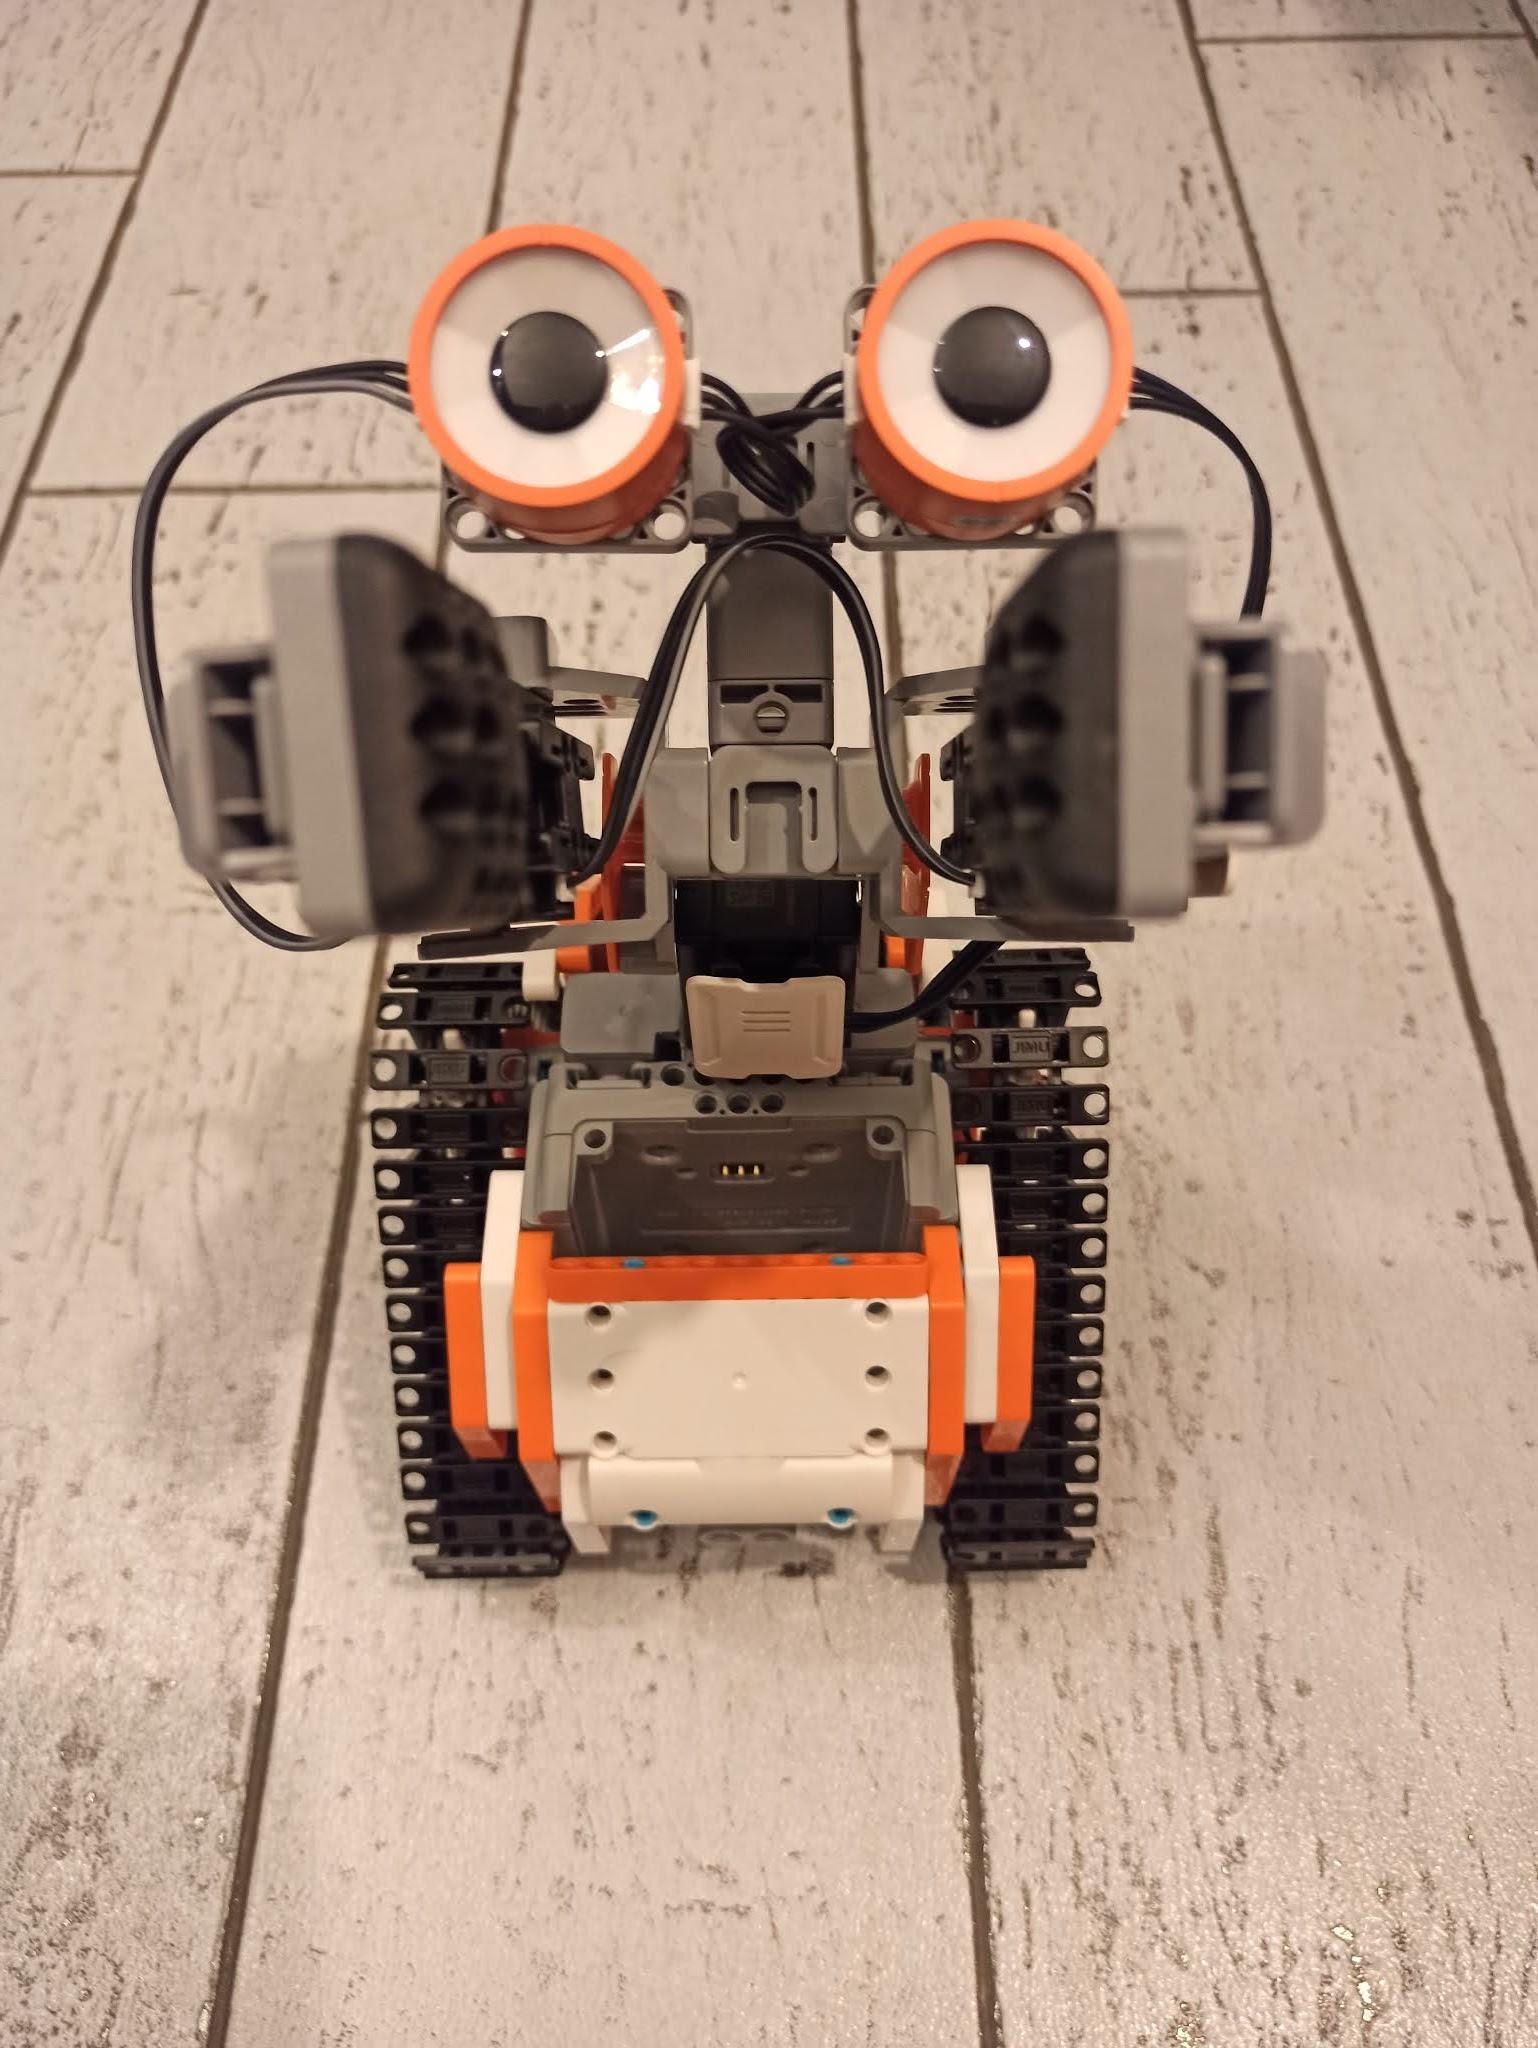 Astrobot Jimu